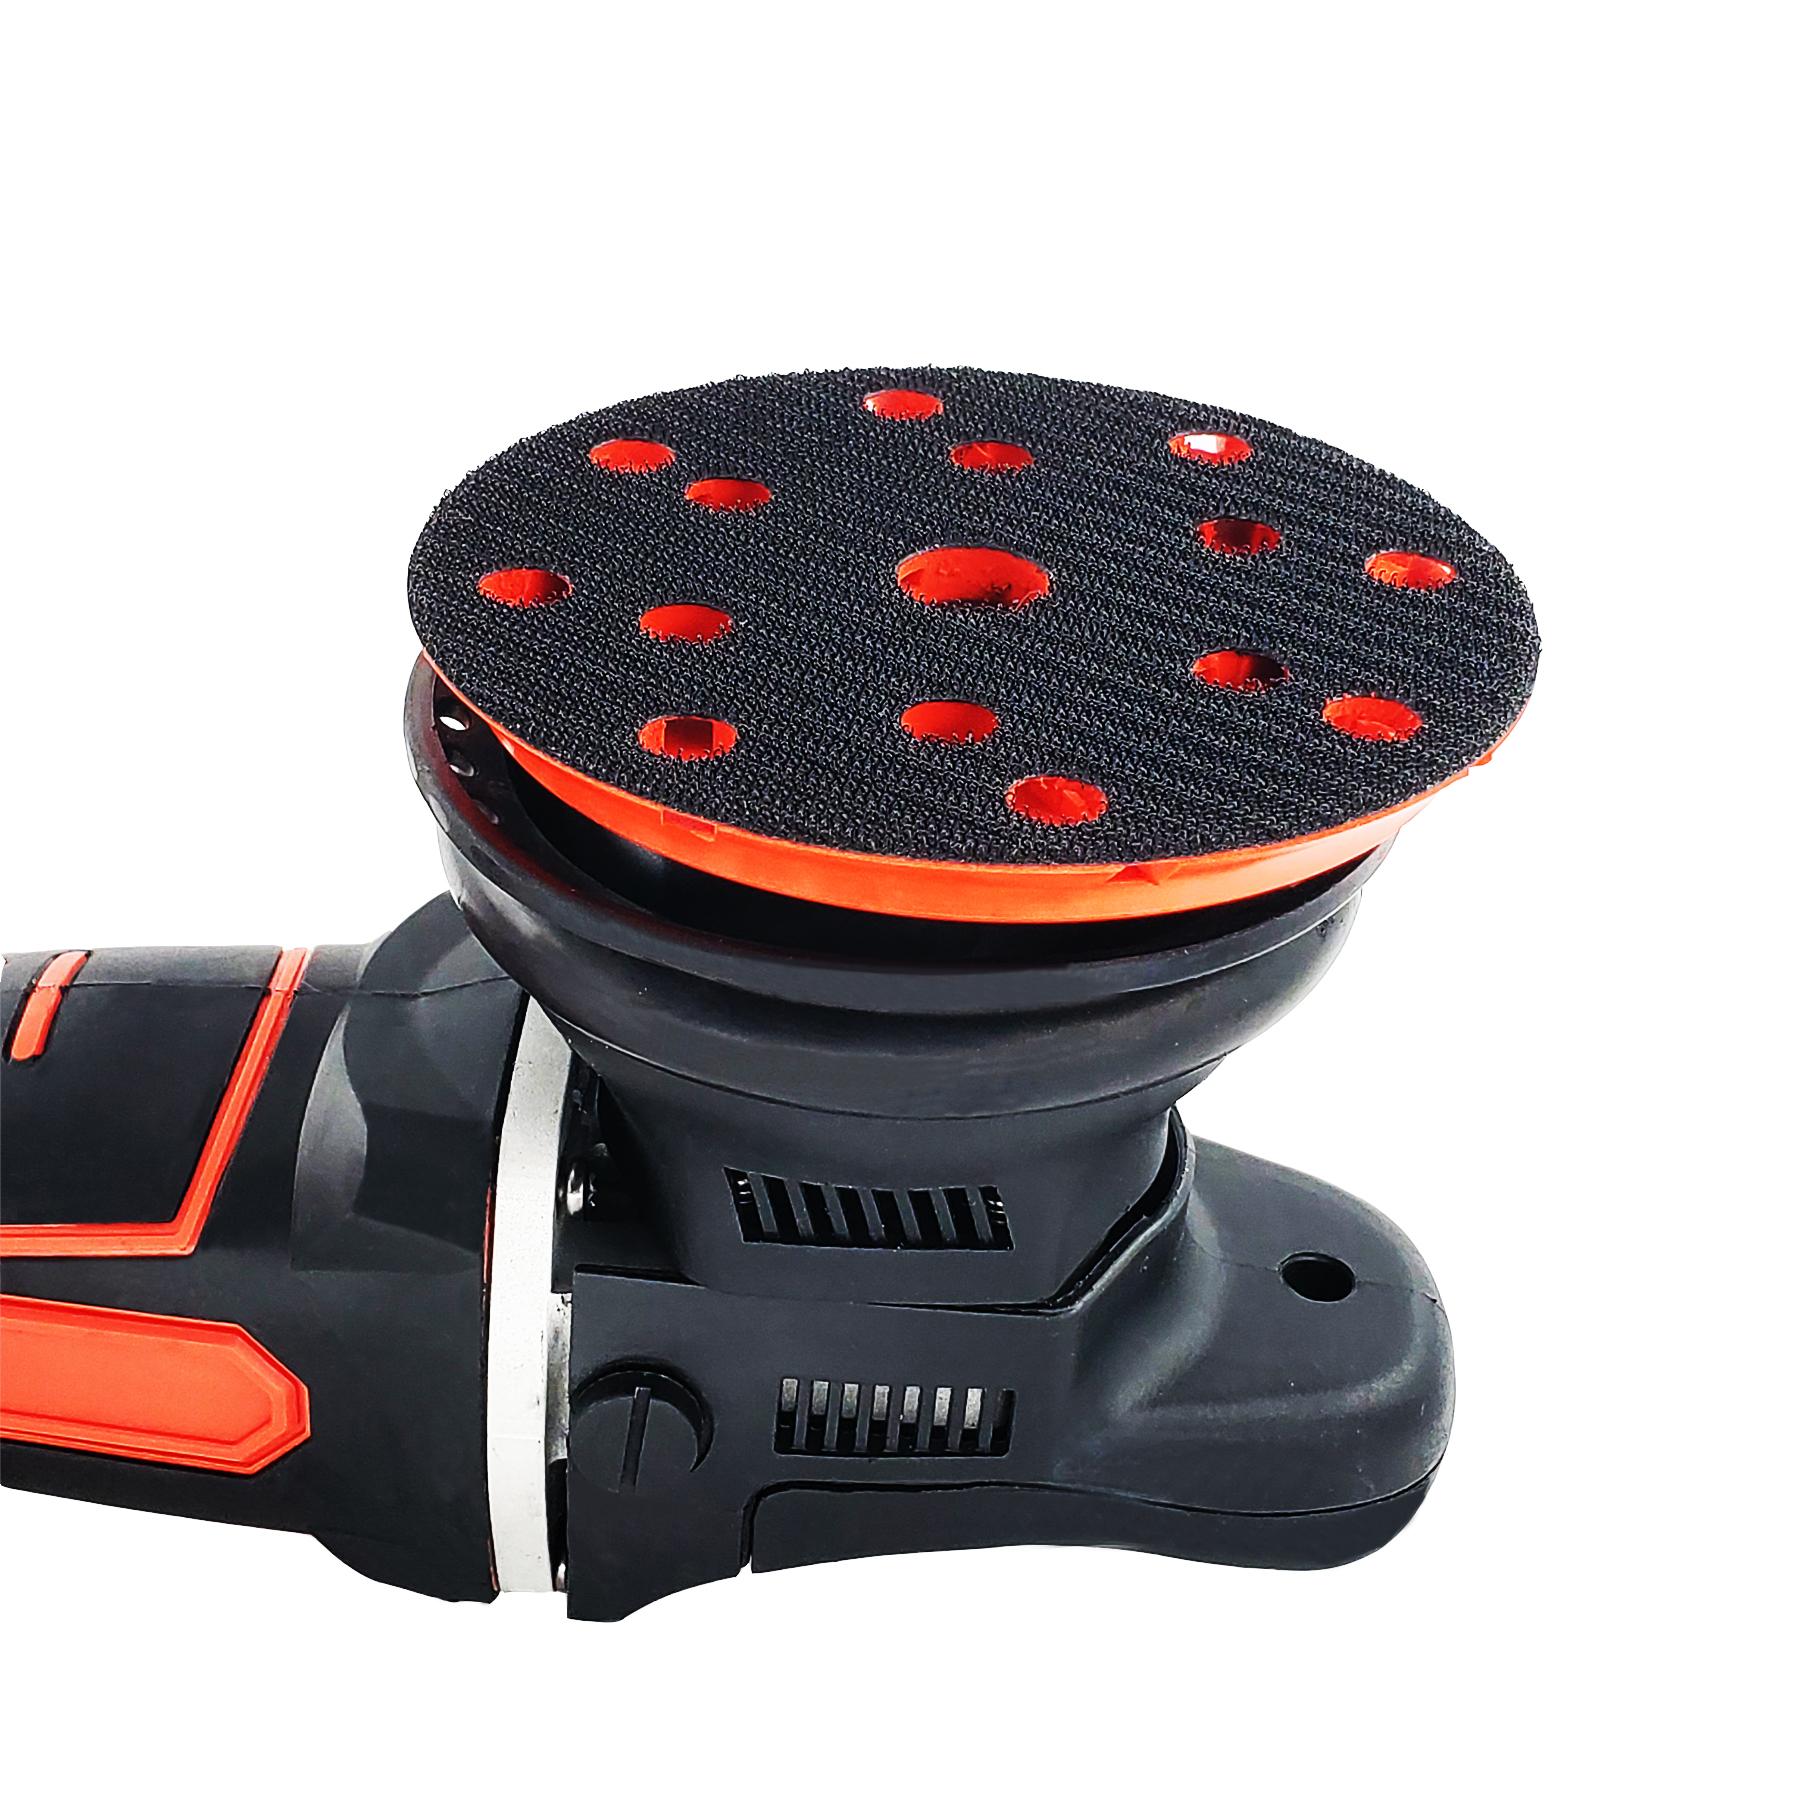 Wholesale Brushless Car Polishing Machine Cutomized Portable 15MM Lithium Cordless Car Polisher For Buffing